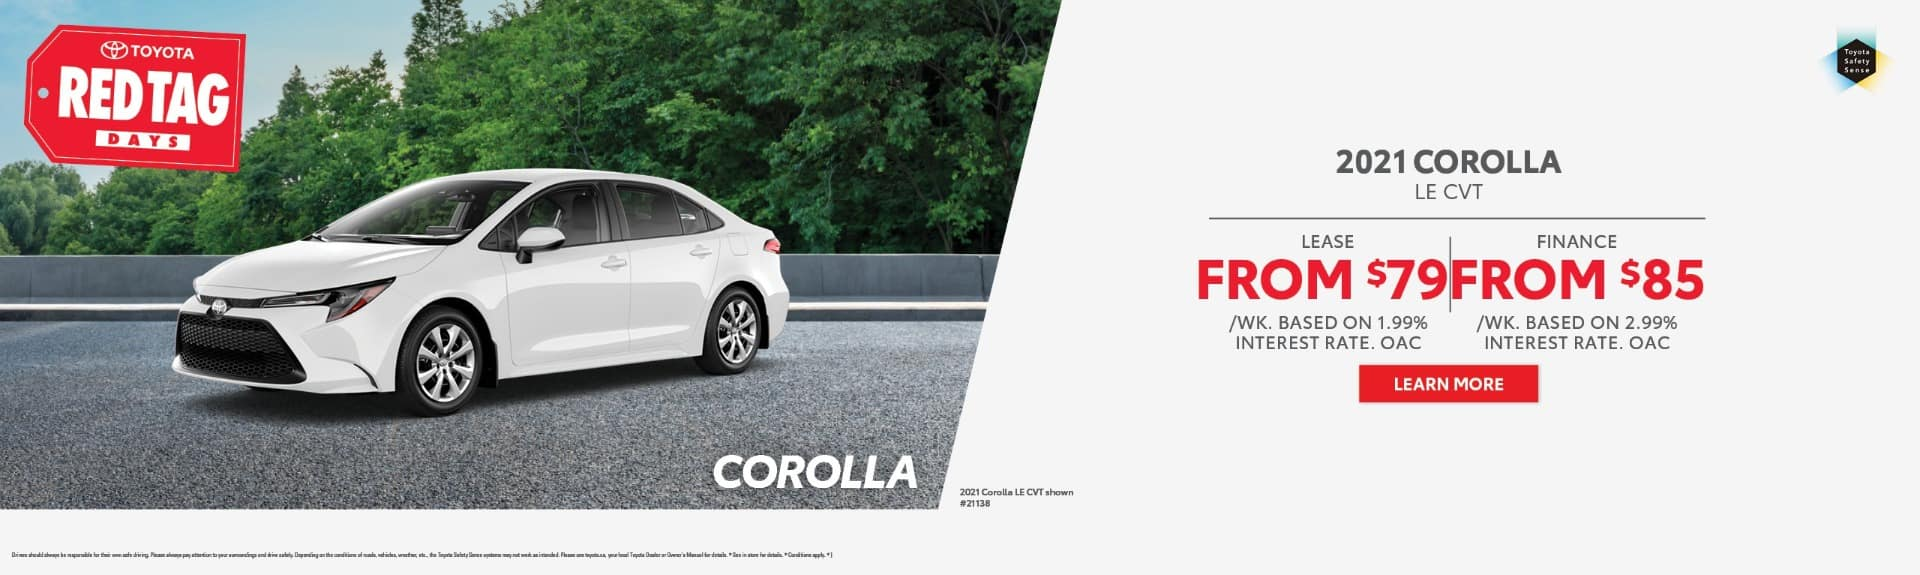 2021 Corolla Offer BC